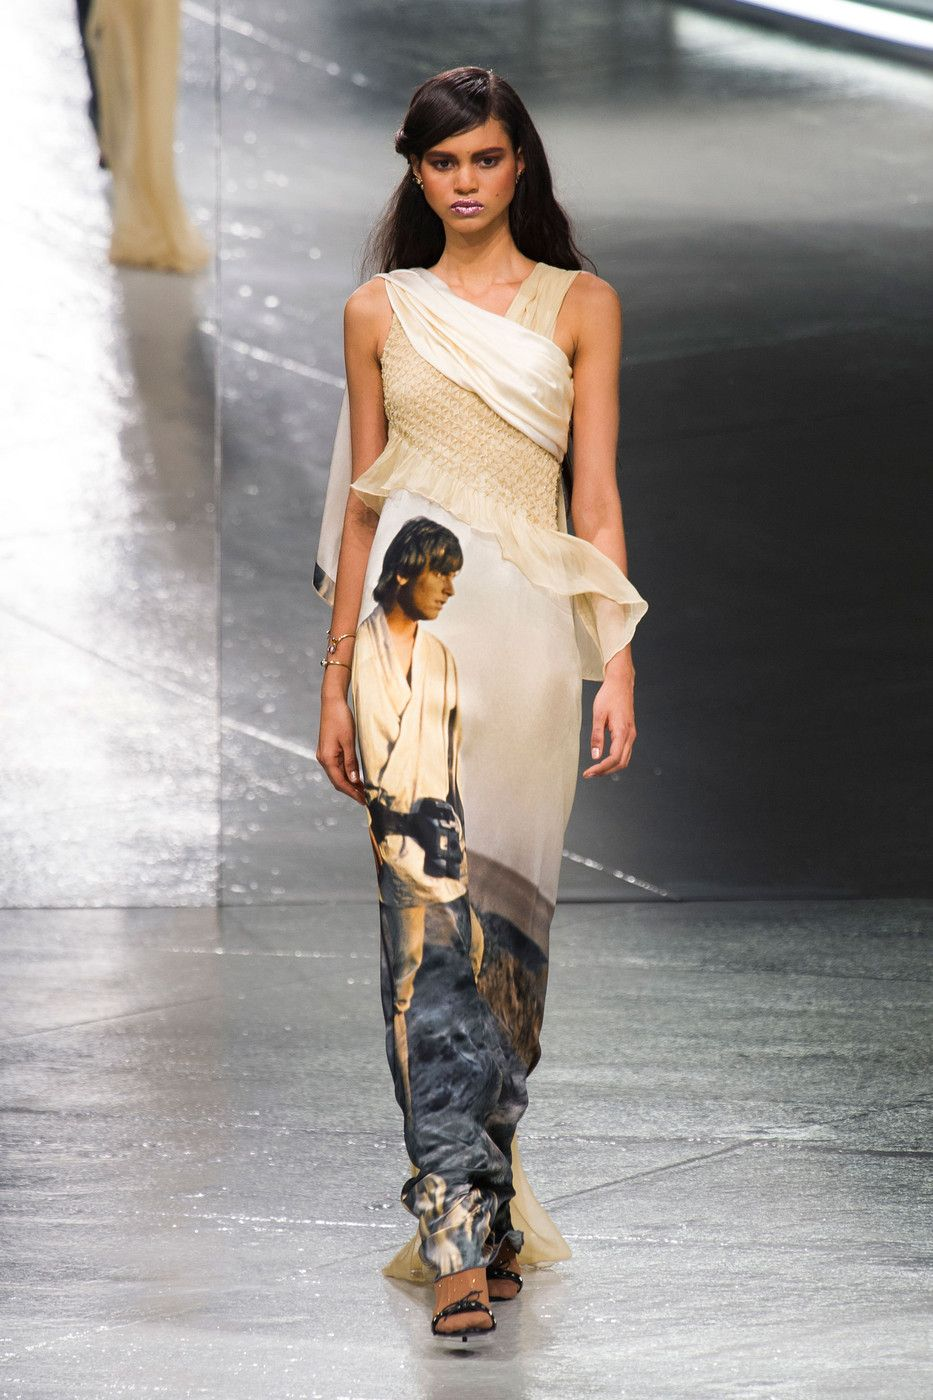 Has Star Wars gone high fashion? | Rodarte Fall 2014